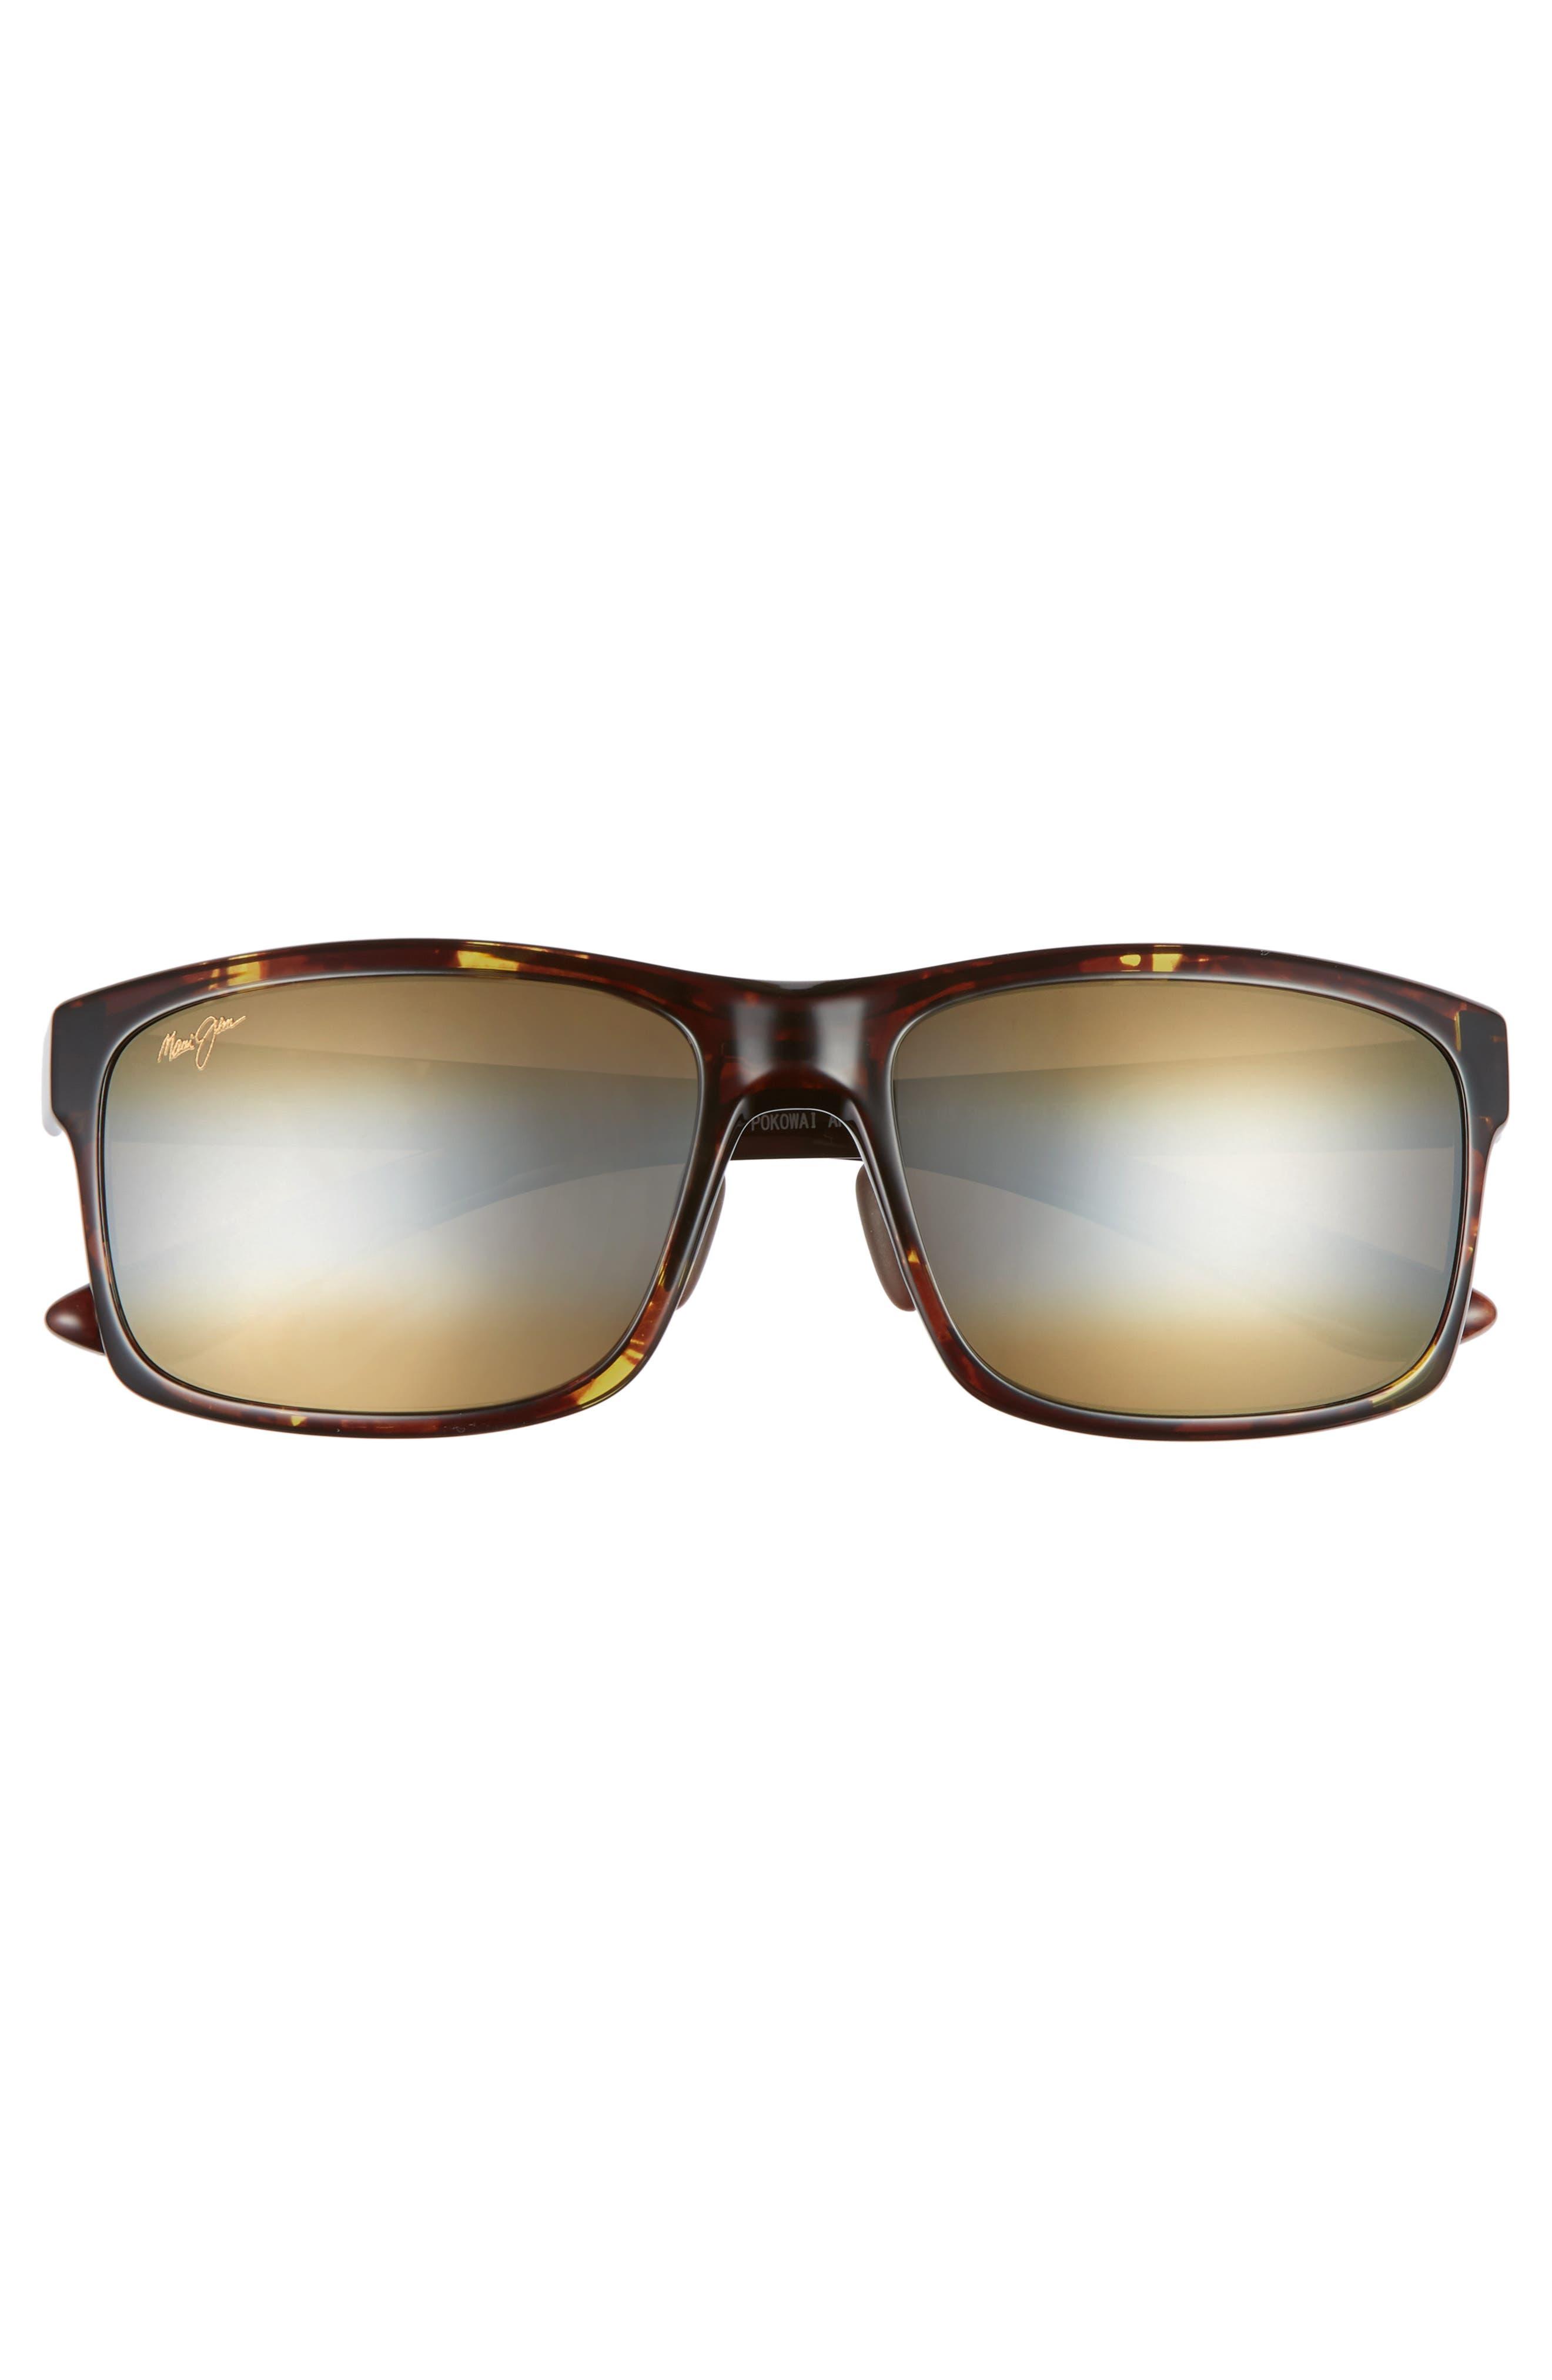 Pokowai Arch 58mm Polarized Sunglasses,                             Alternate thumbnail 2, color,                             Olive Tortoise/ Bronze